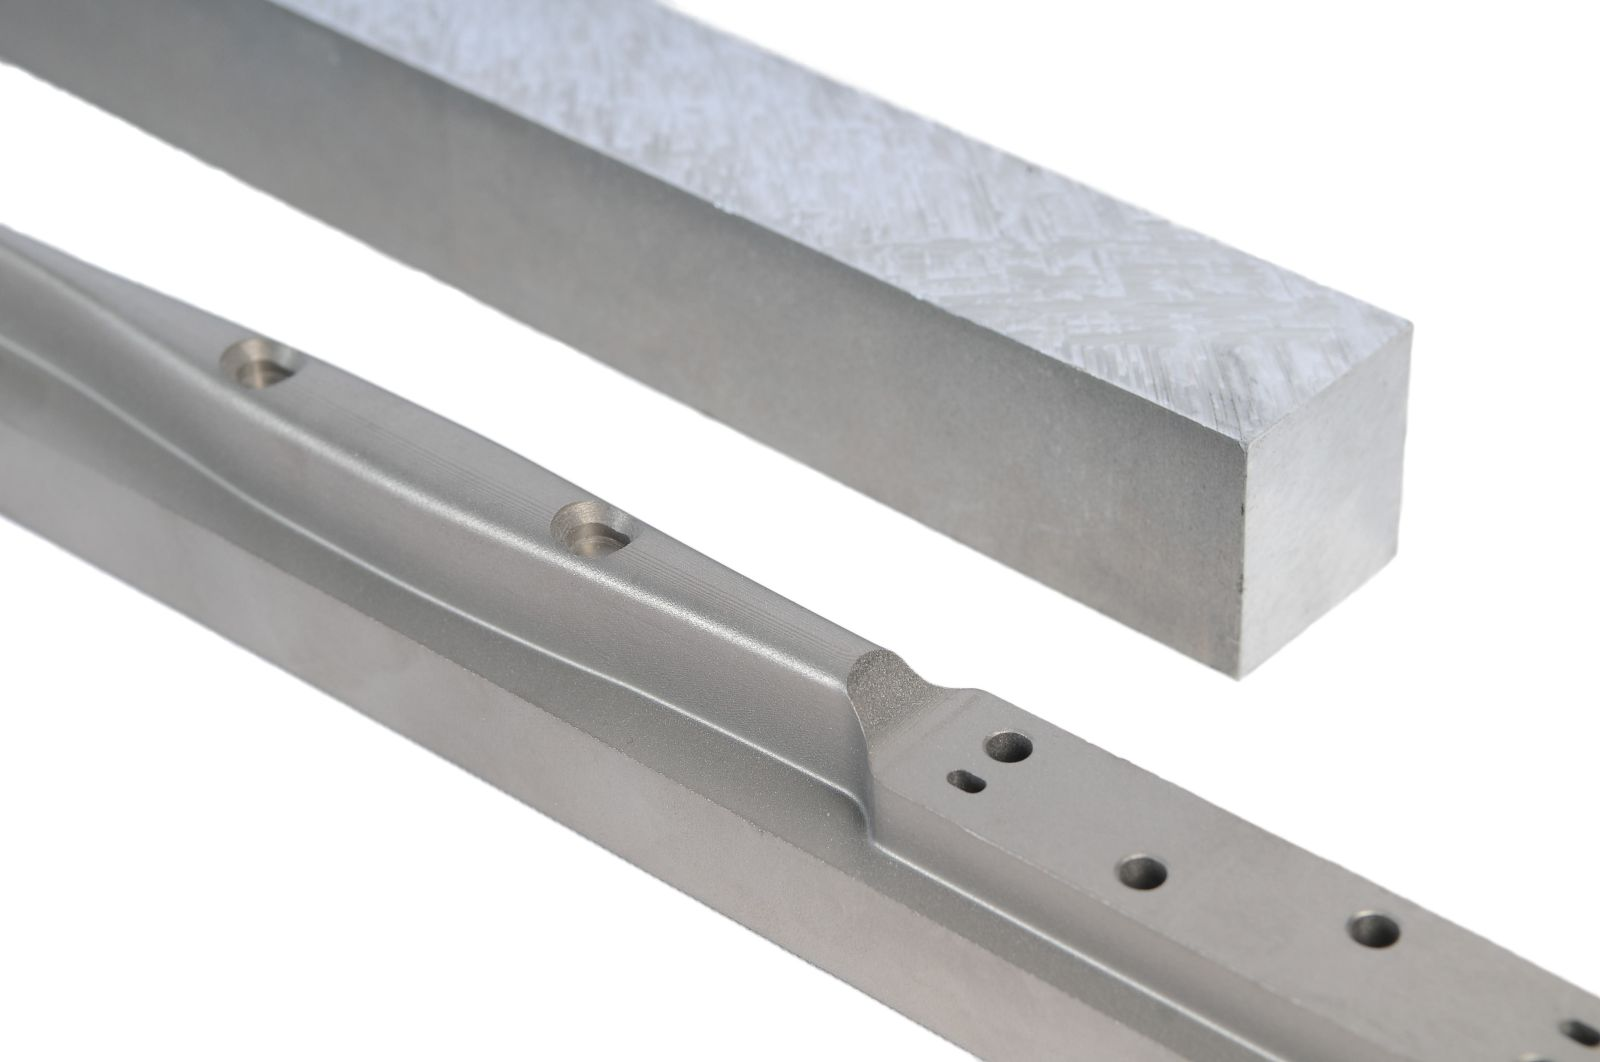 Kitefoil carbon aluminium alpinefoil 5 0 access v2 2323 1